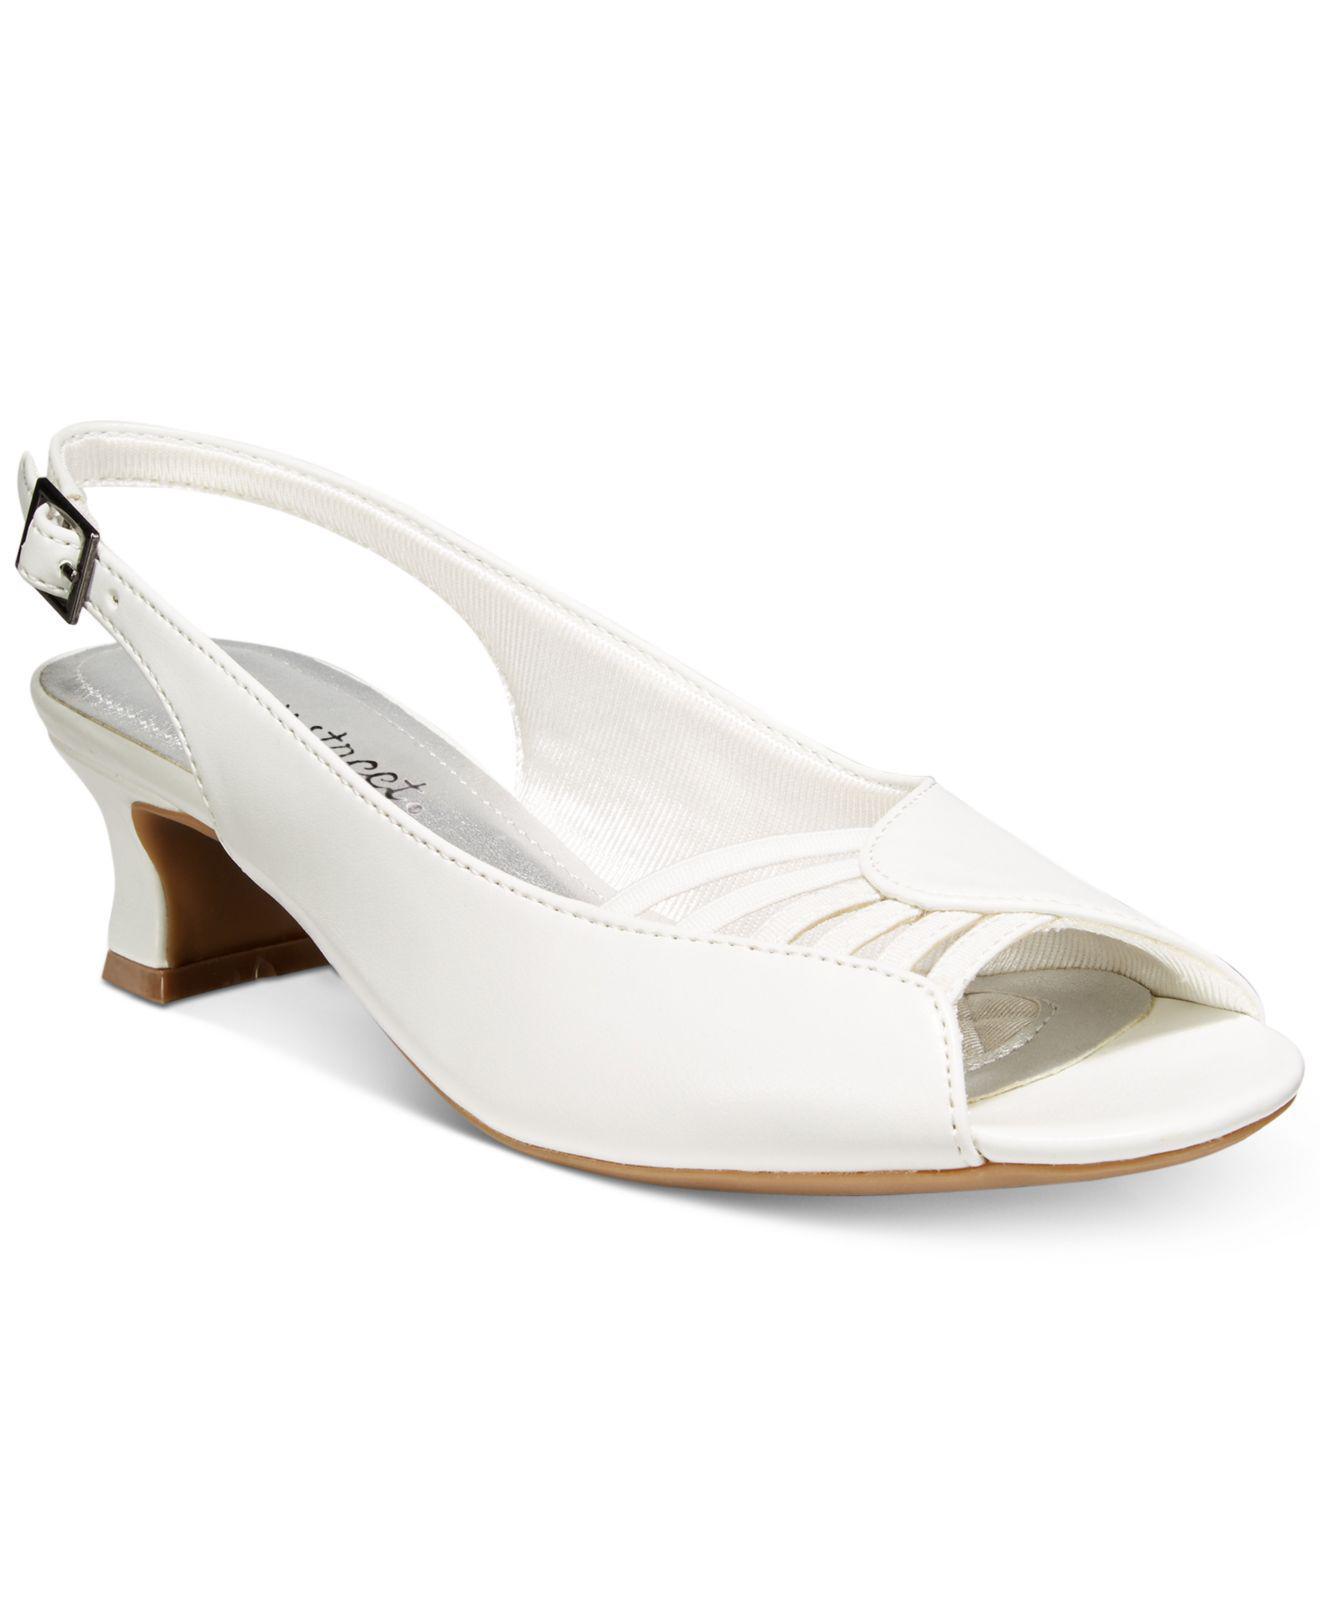 White Slingback Shoes Australia